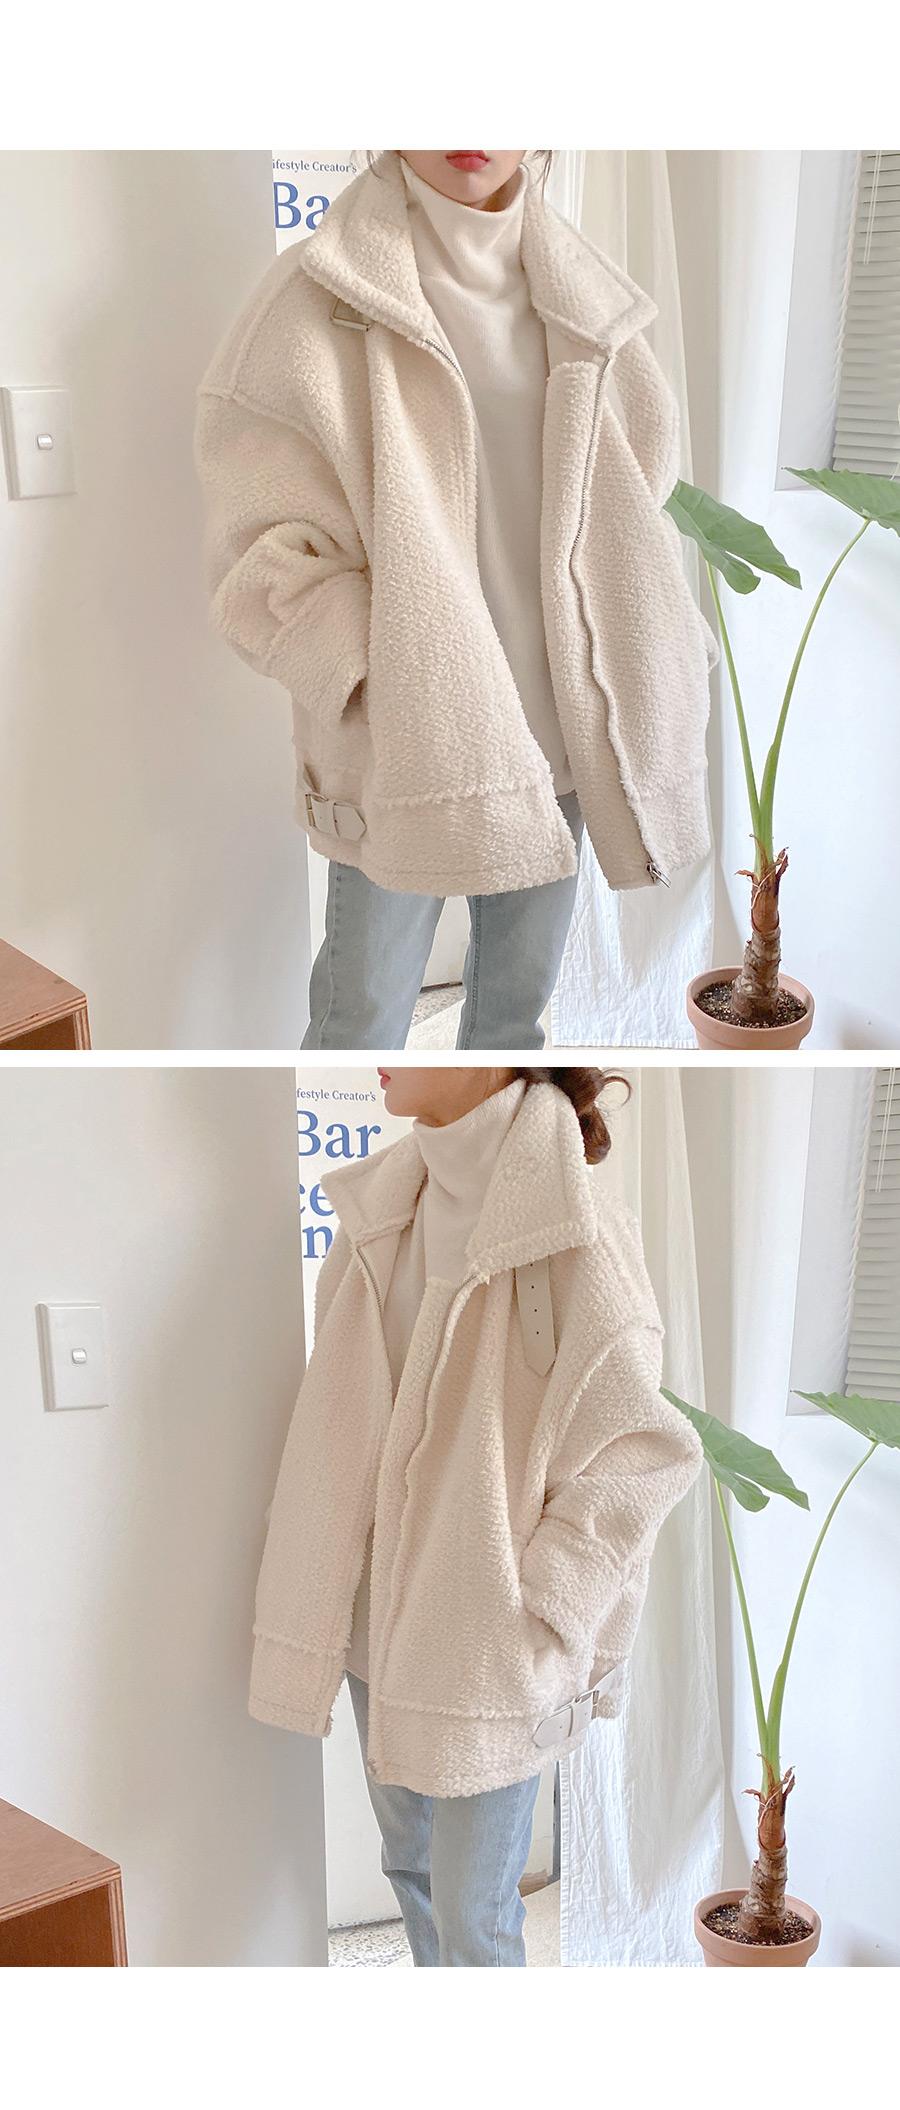 Blanket high neck knit T-shirt